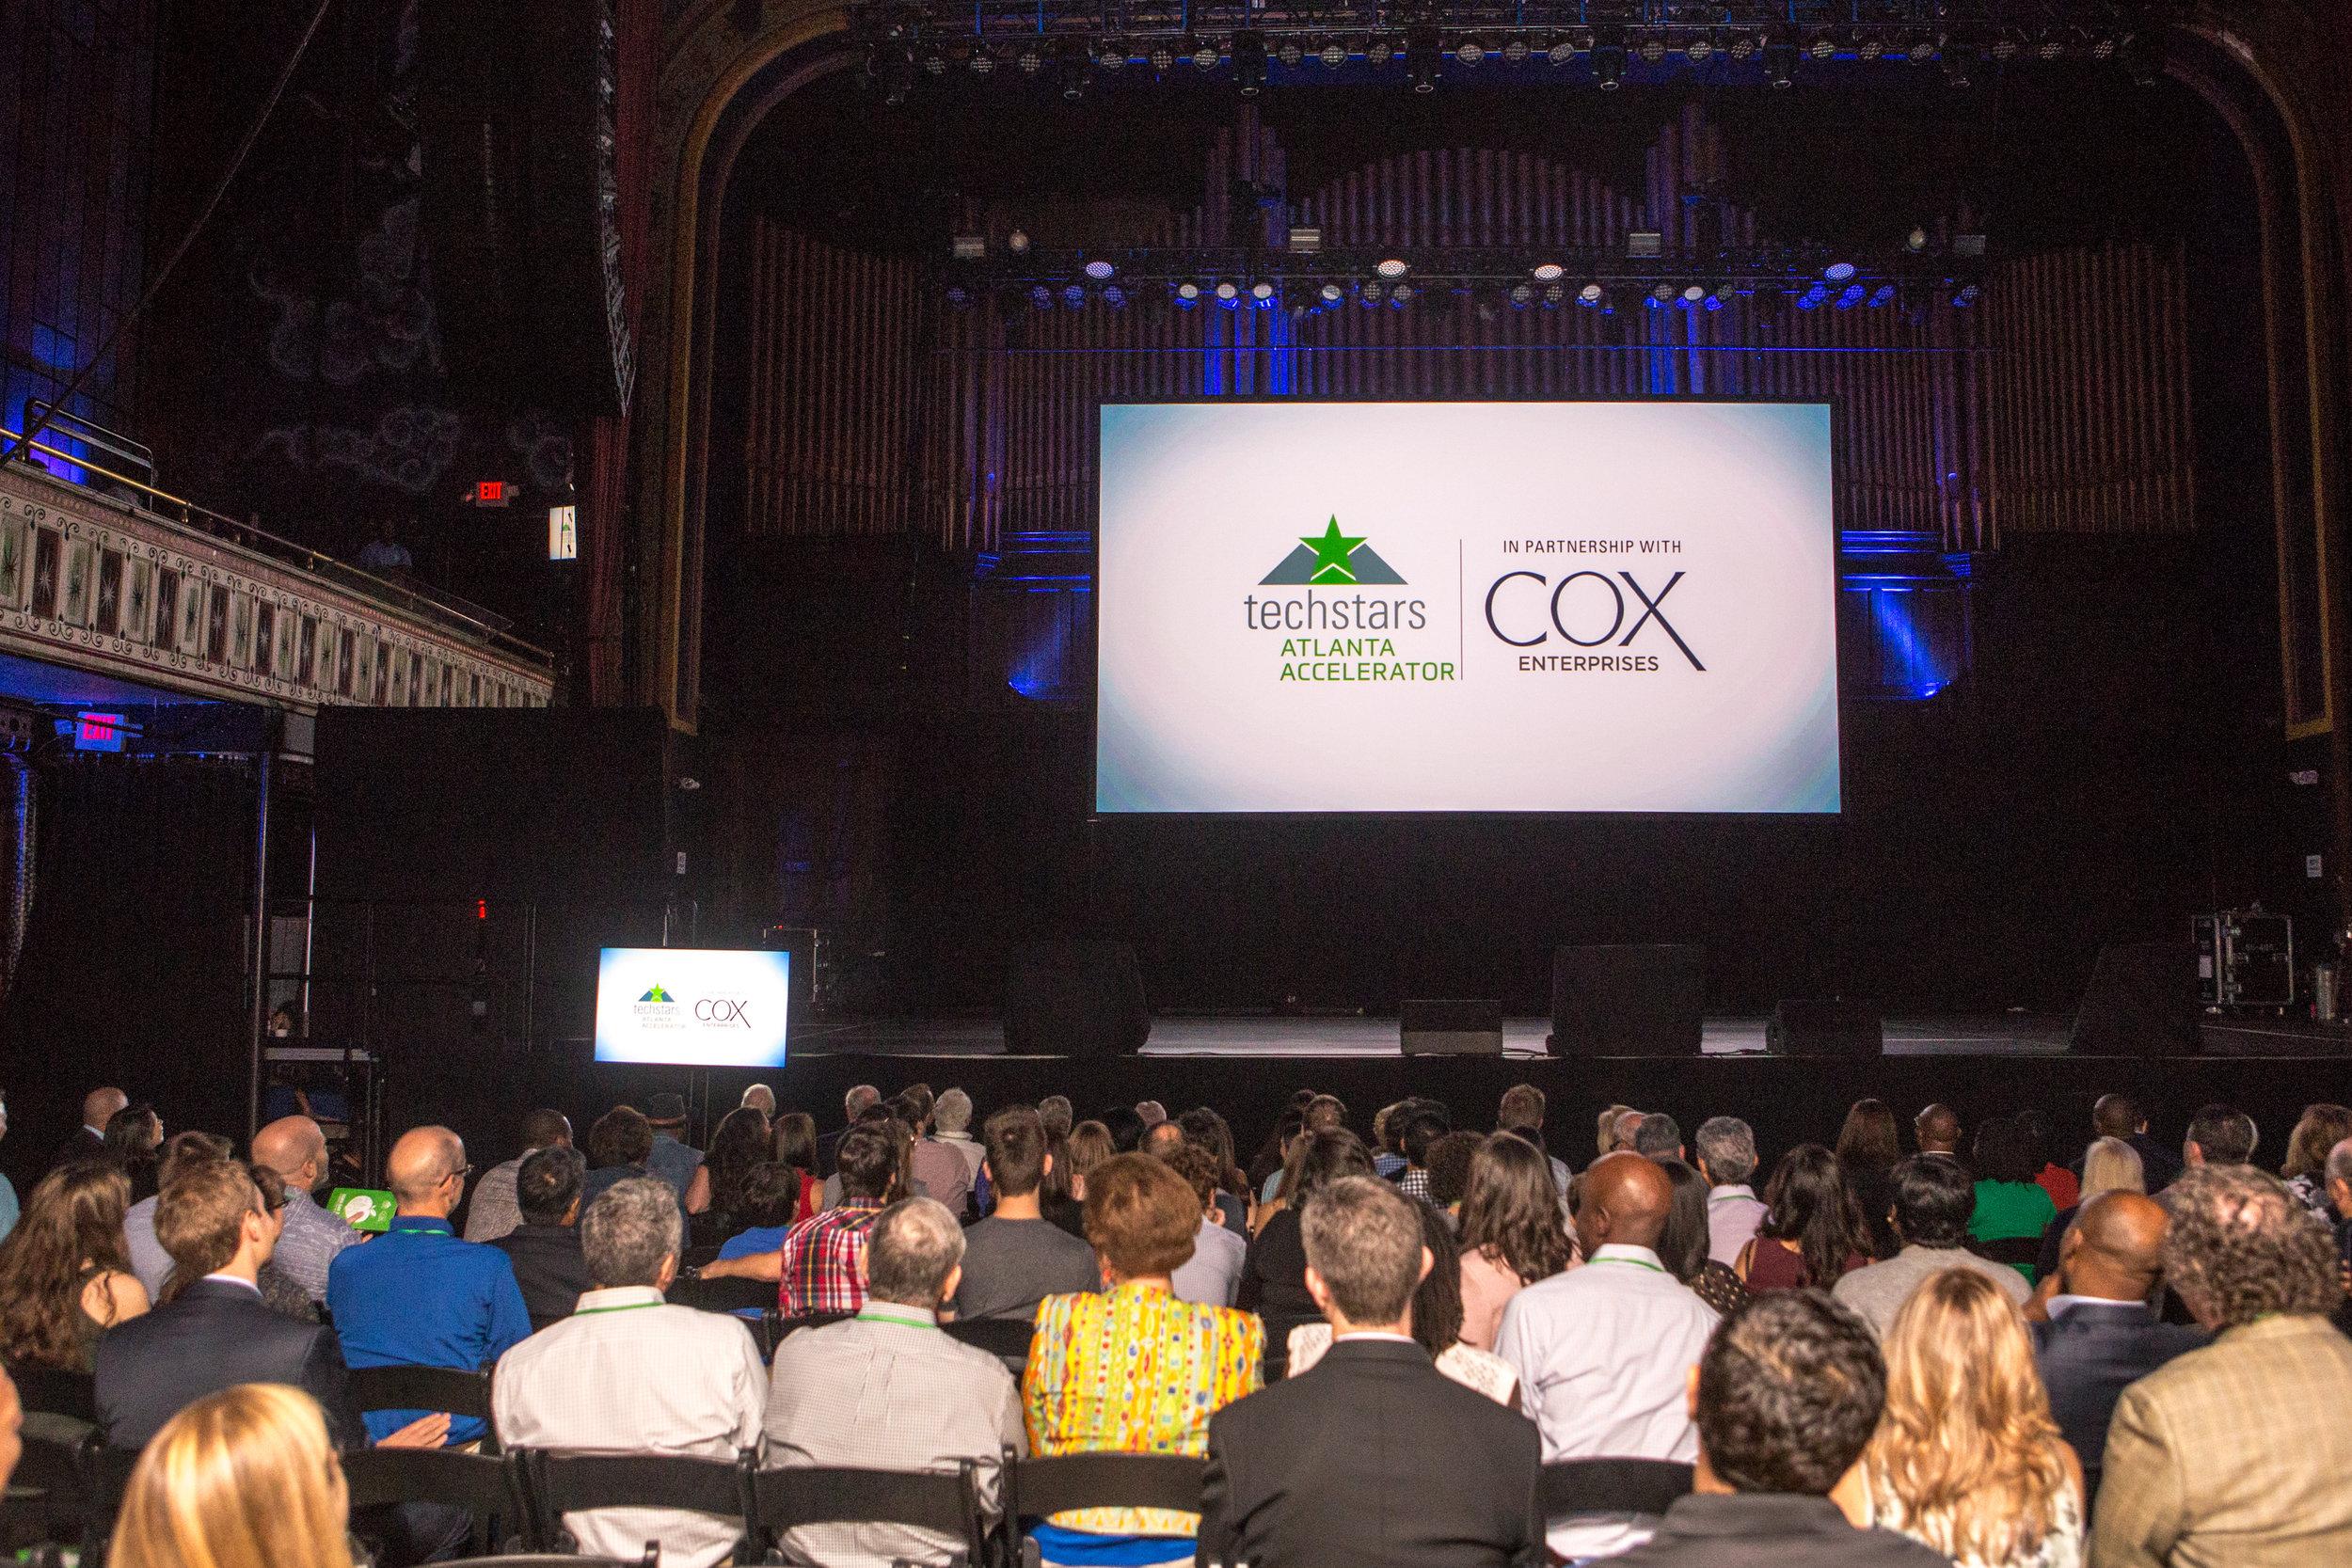 Demo Day is the  culmination of the 13-weeks Techstars Atlanta program (in partnership with Cox Enterprises) | PHOTO:  Jenni Girtman